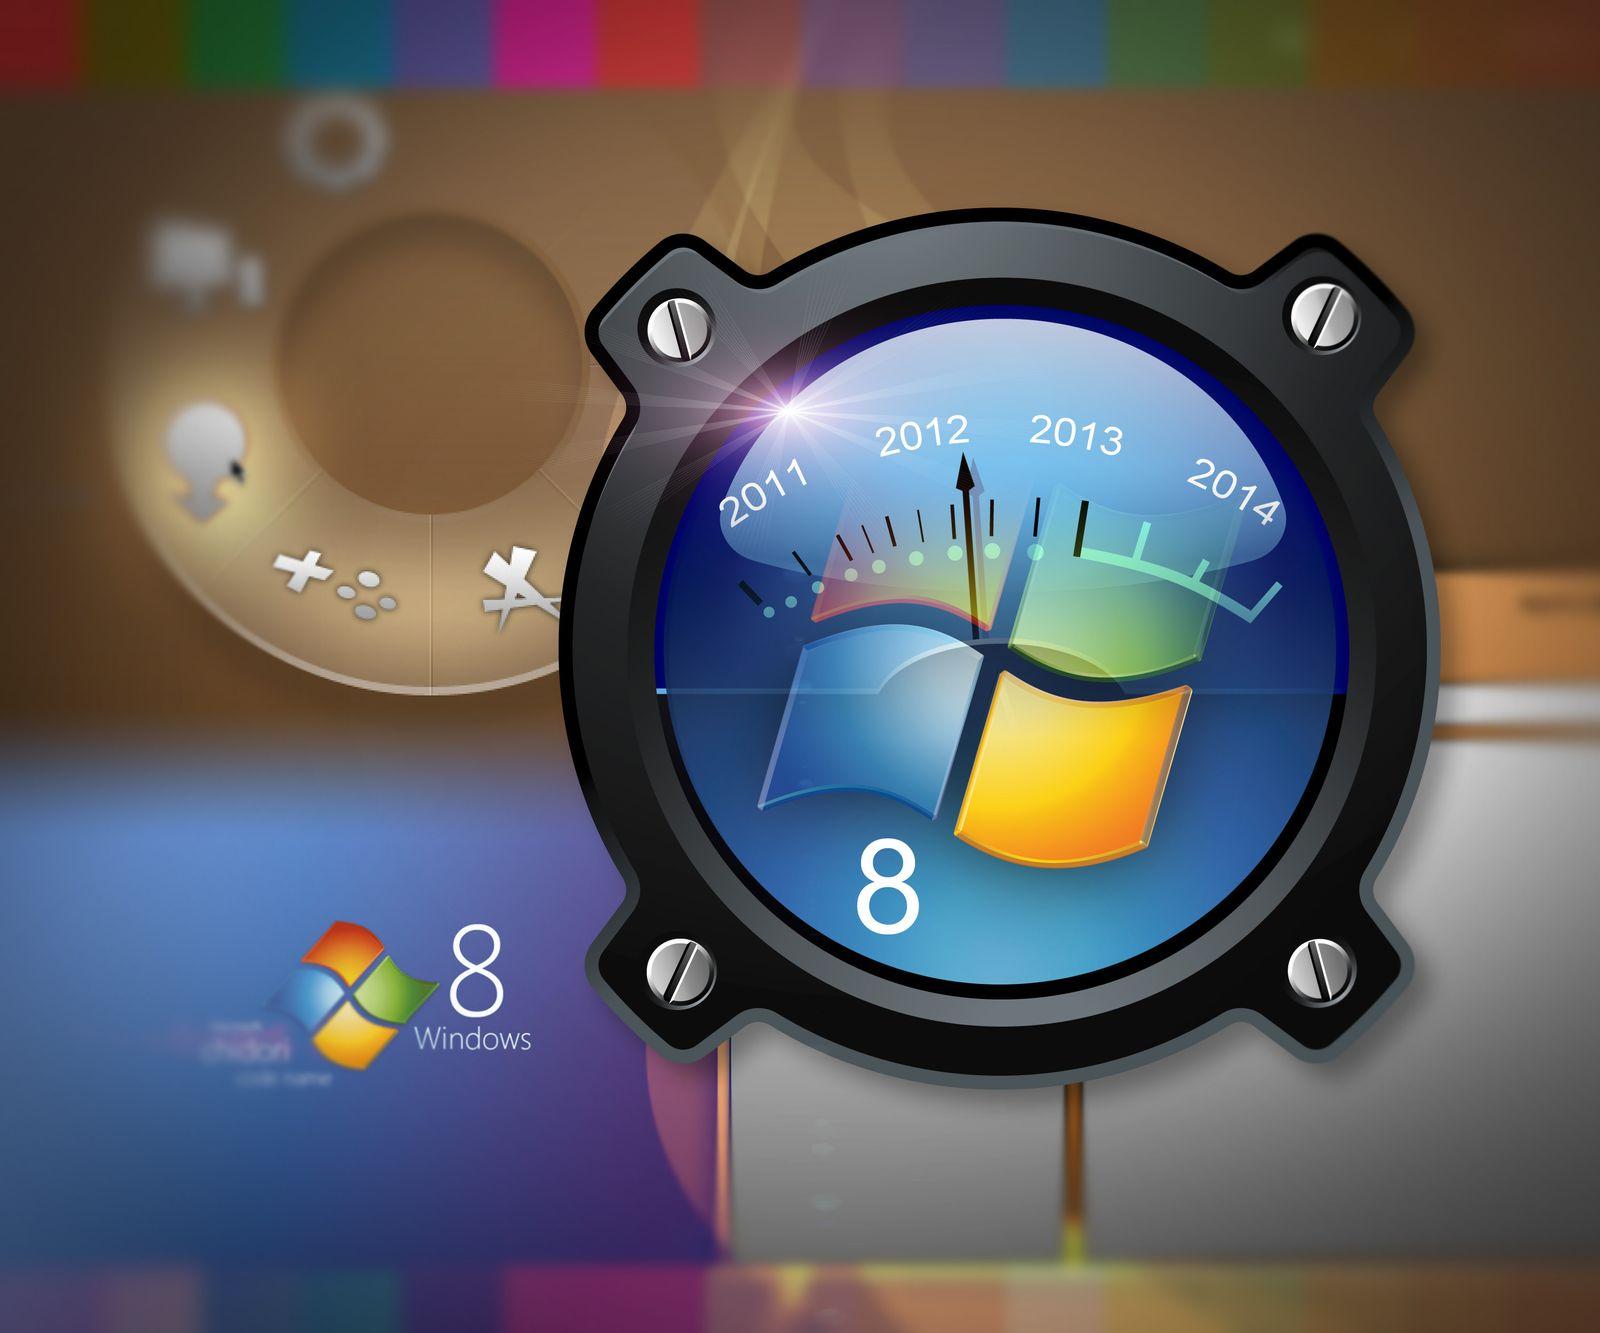 Windows 8 - Simulation